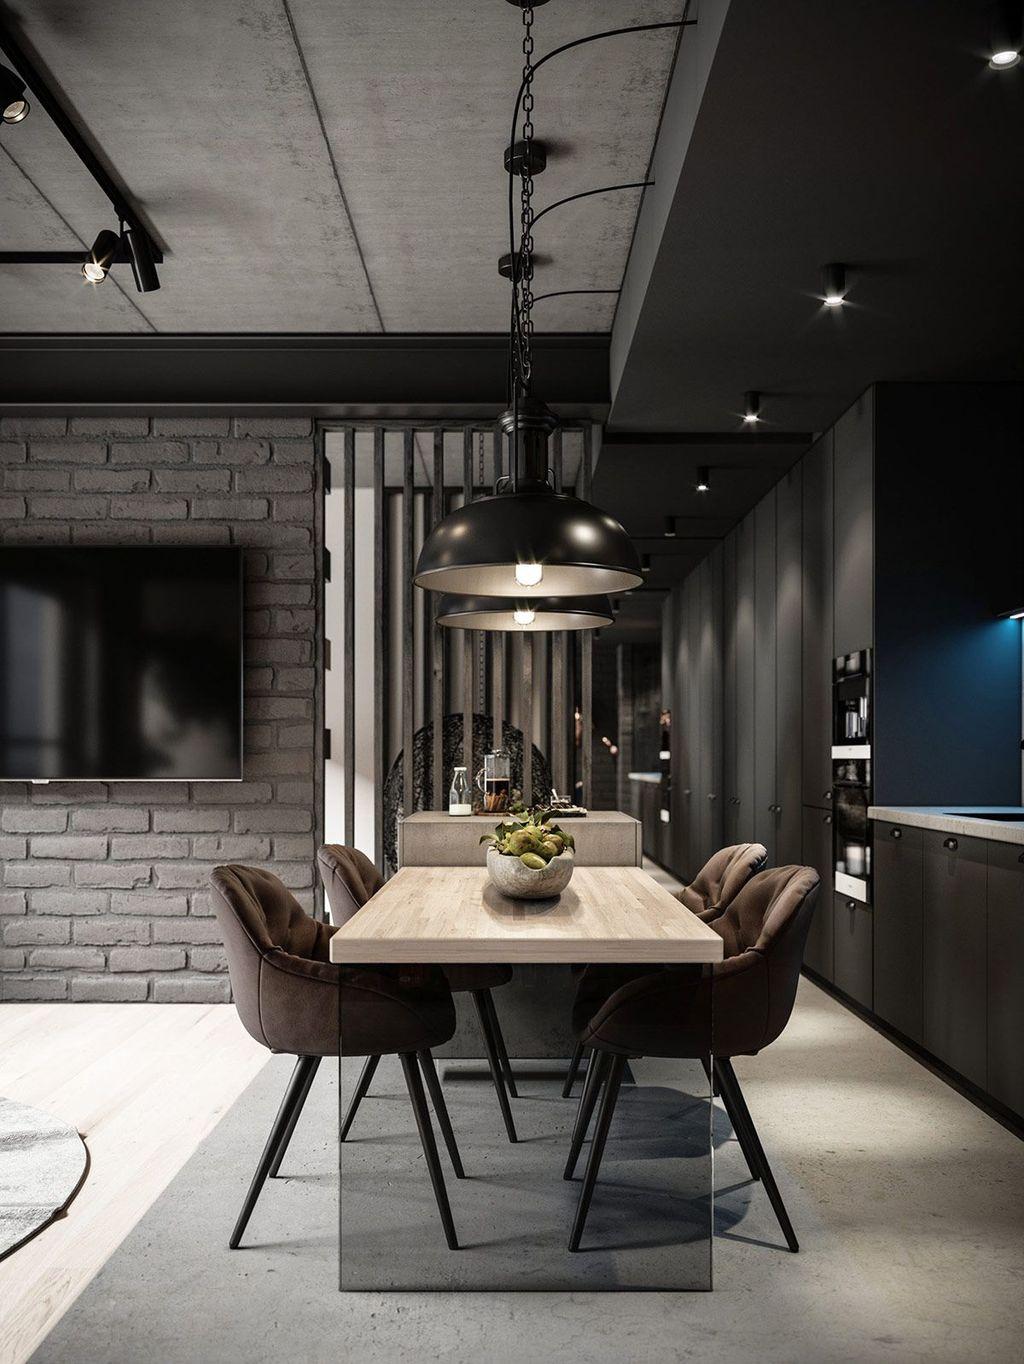 Popular Modern Dining Room Design Ideas You Should Copy 04